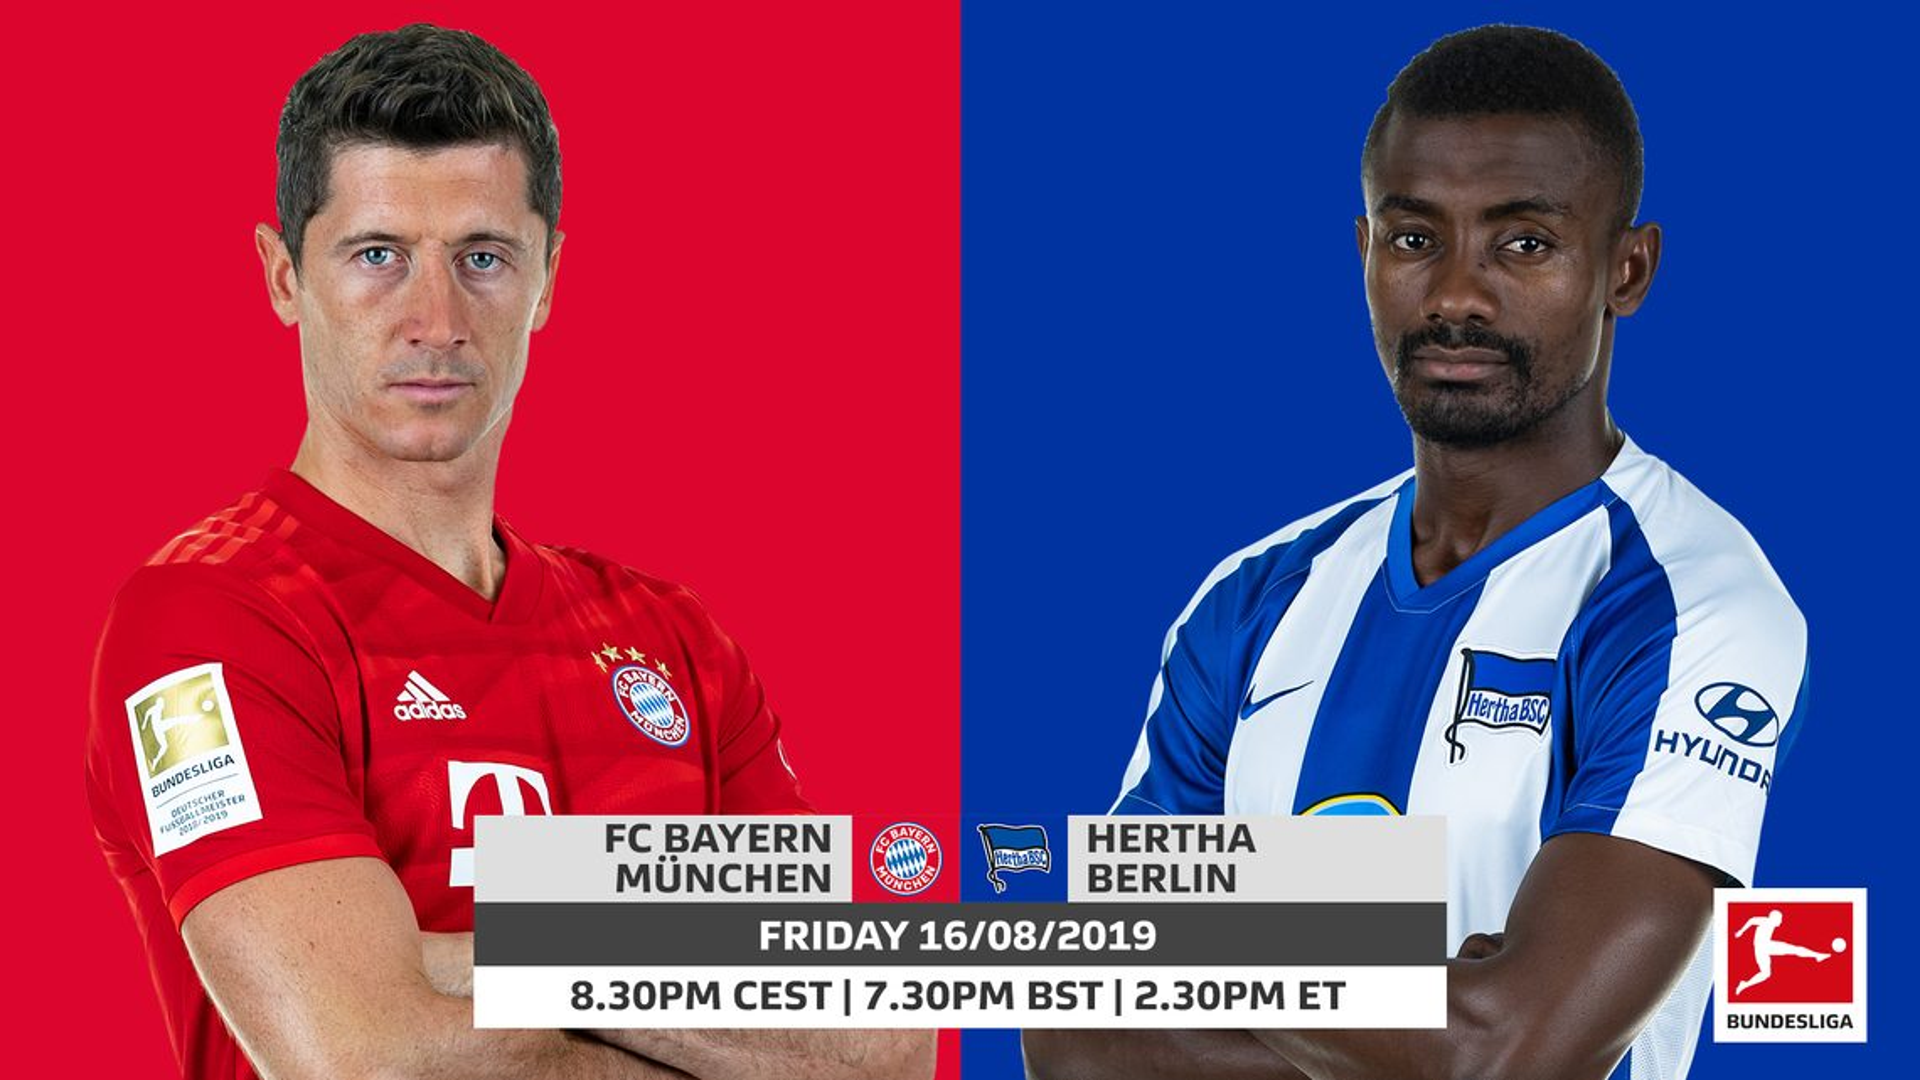 Bayern Munich vs. Hertha Berlin: probable line-ups, stats and LIVE blog